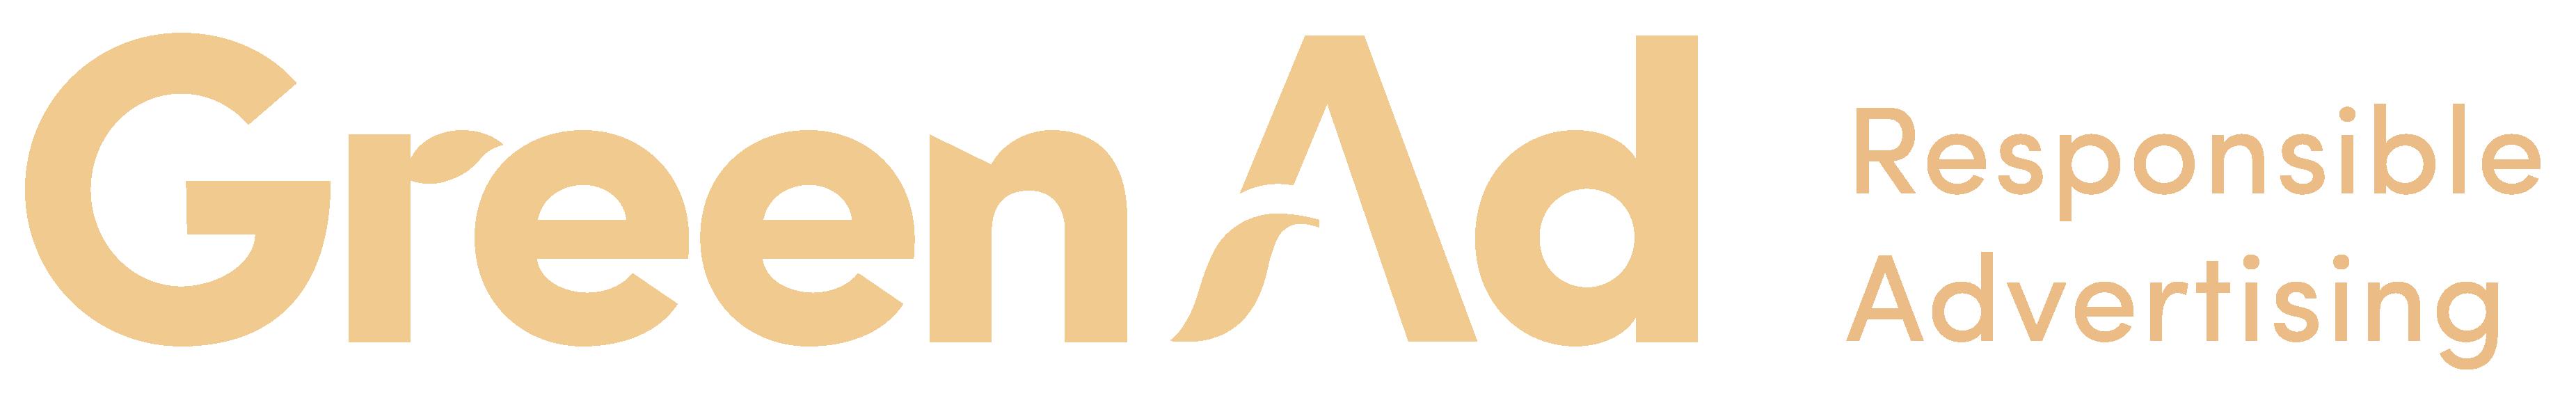 GreenAd Agency